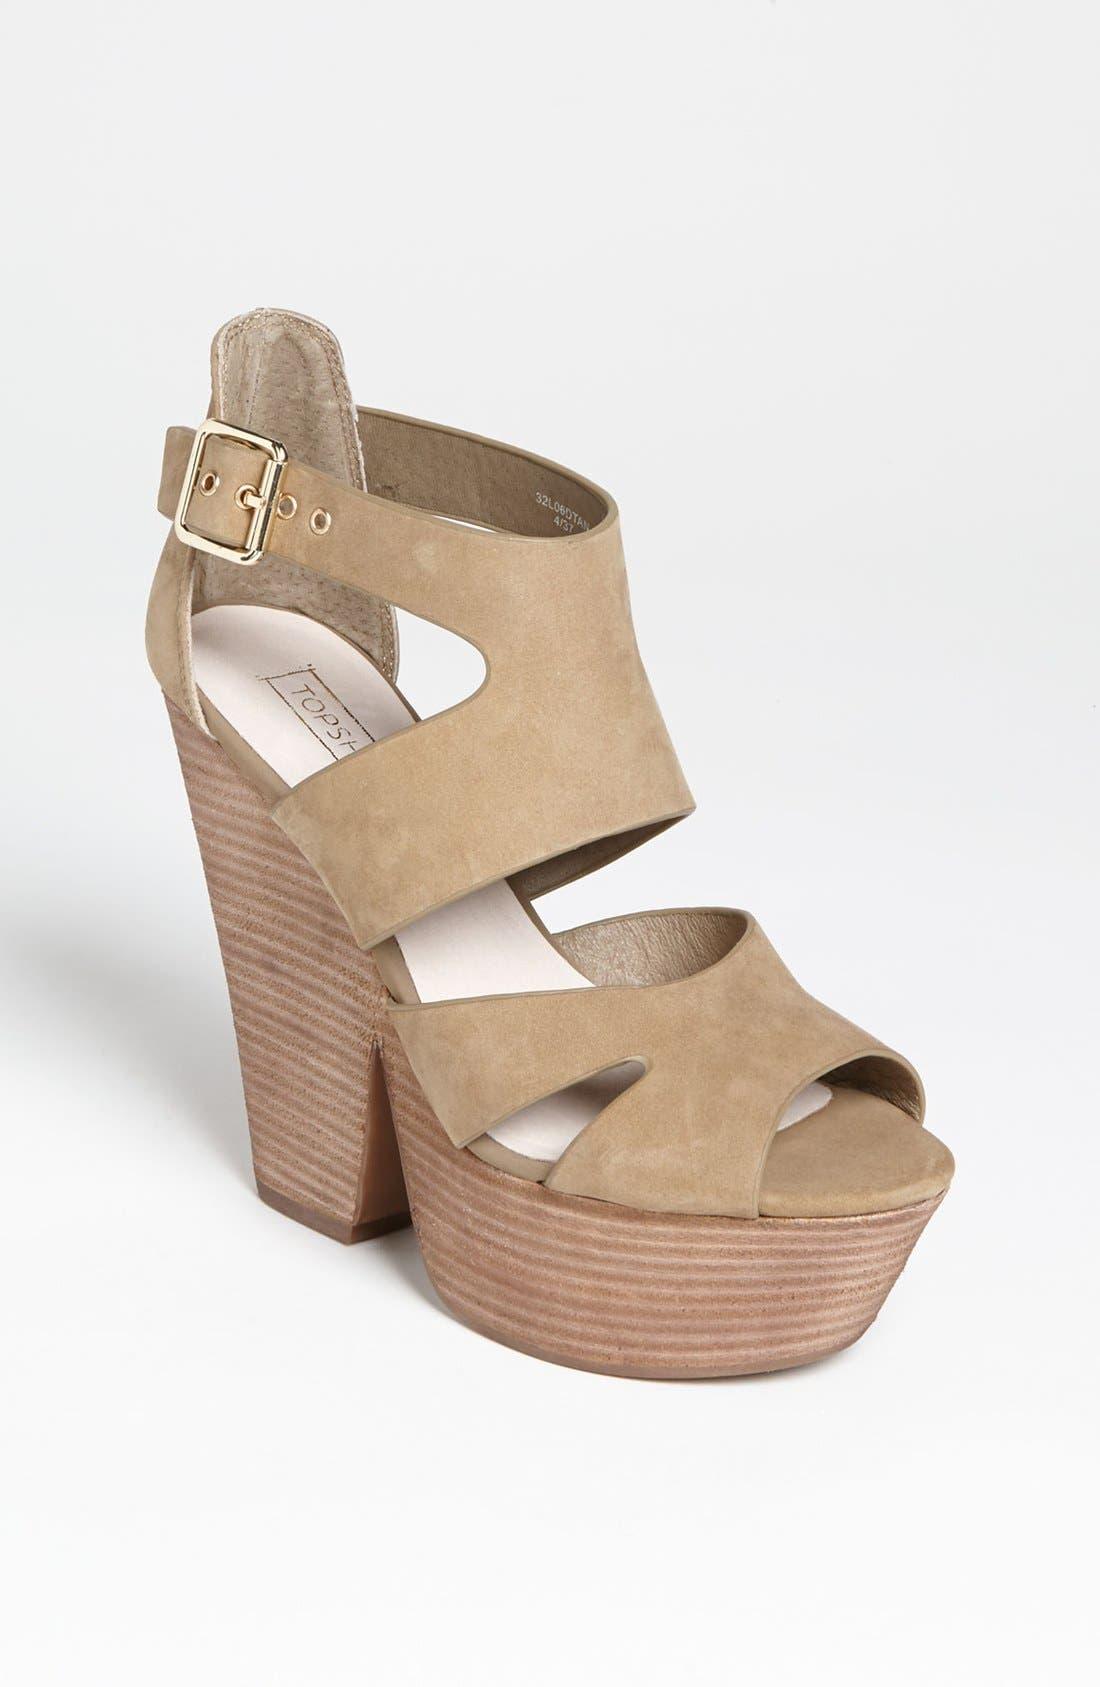 Alternate Image 1 Selected - Topshop 'Lanie' High Vamp Cutout Sandal